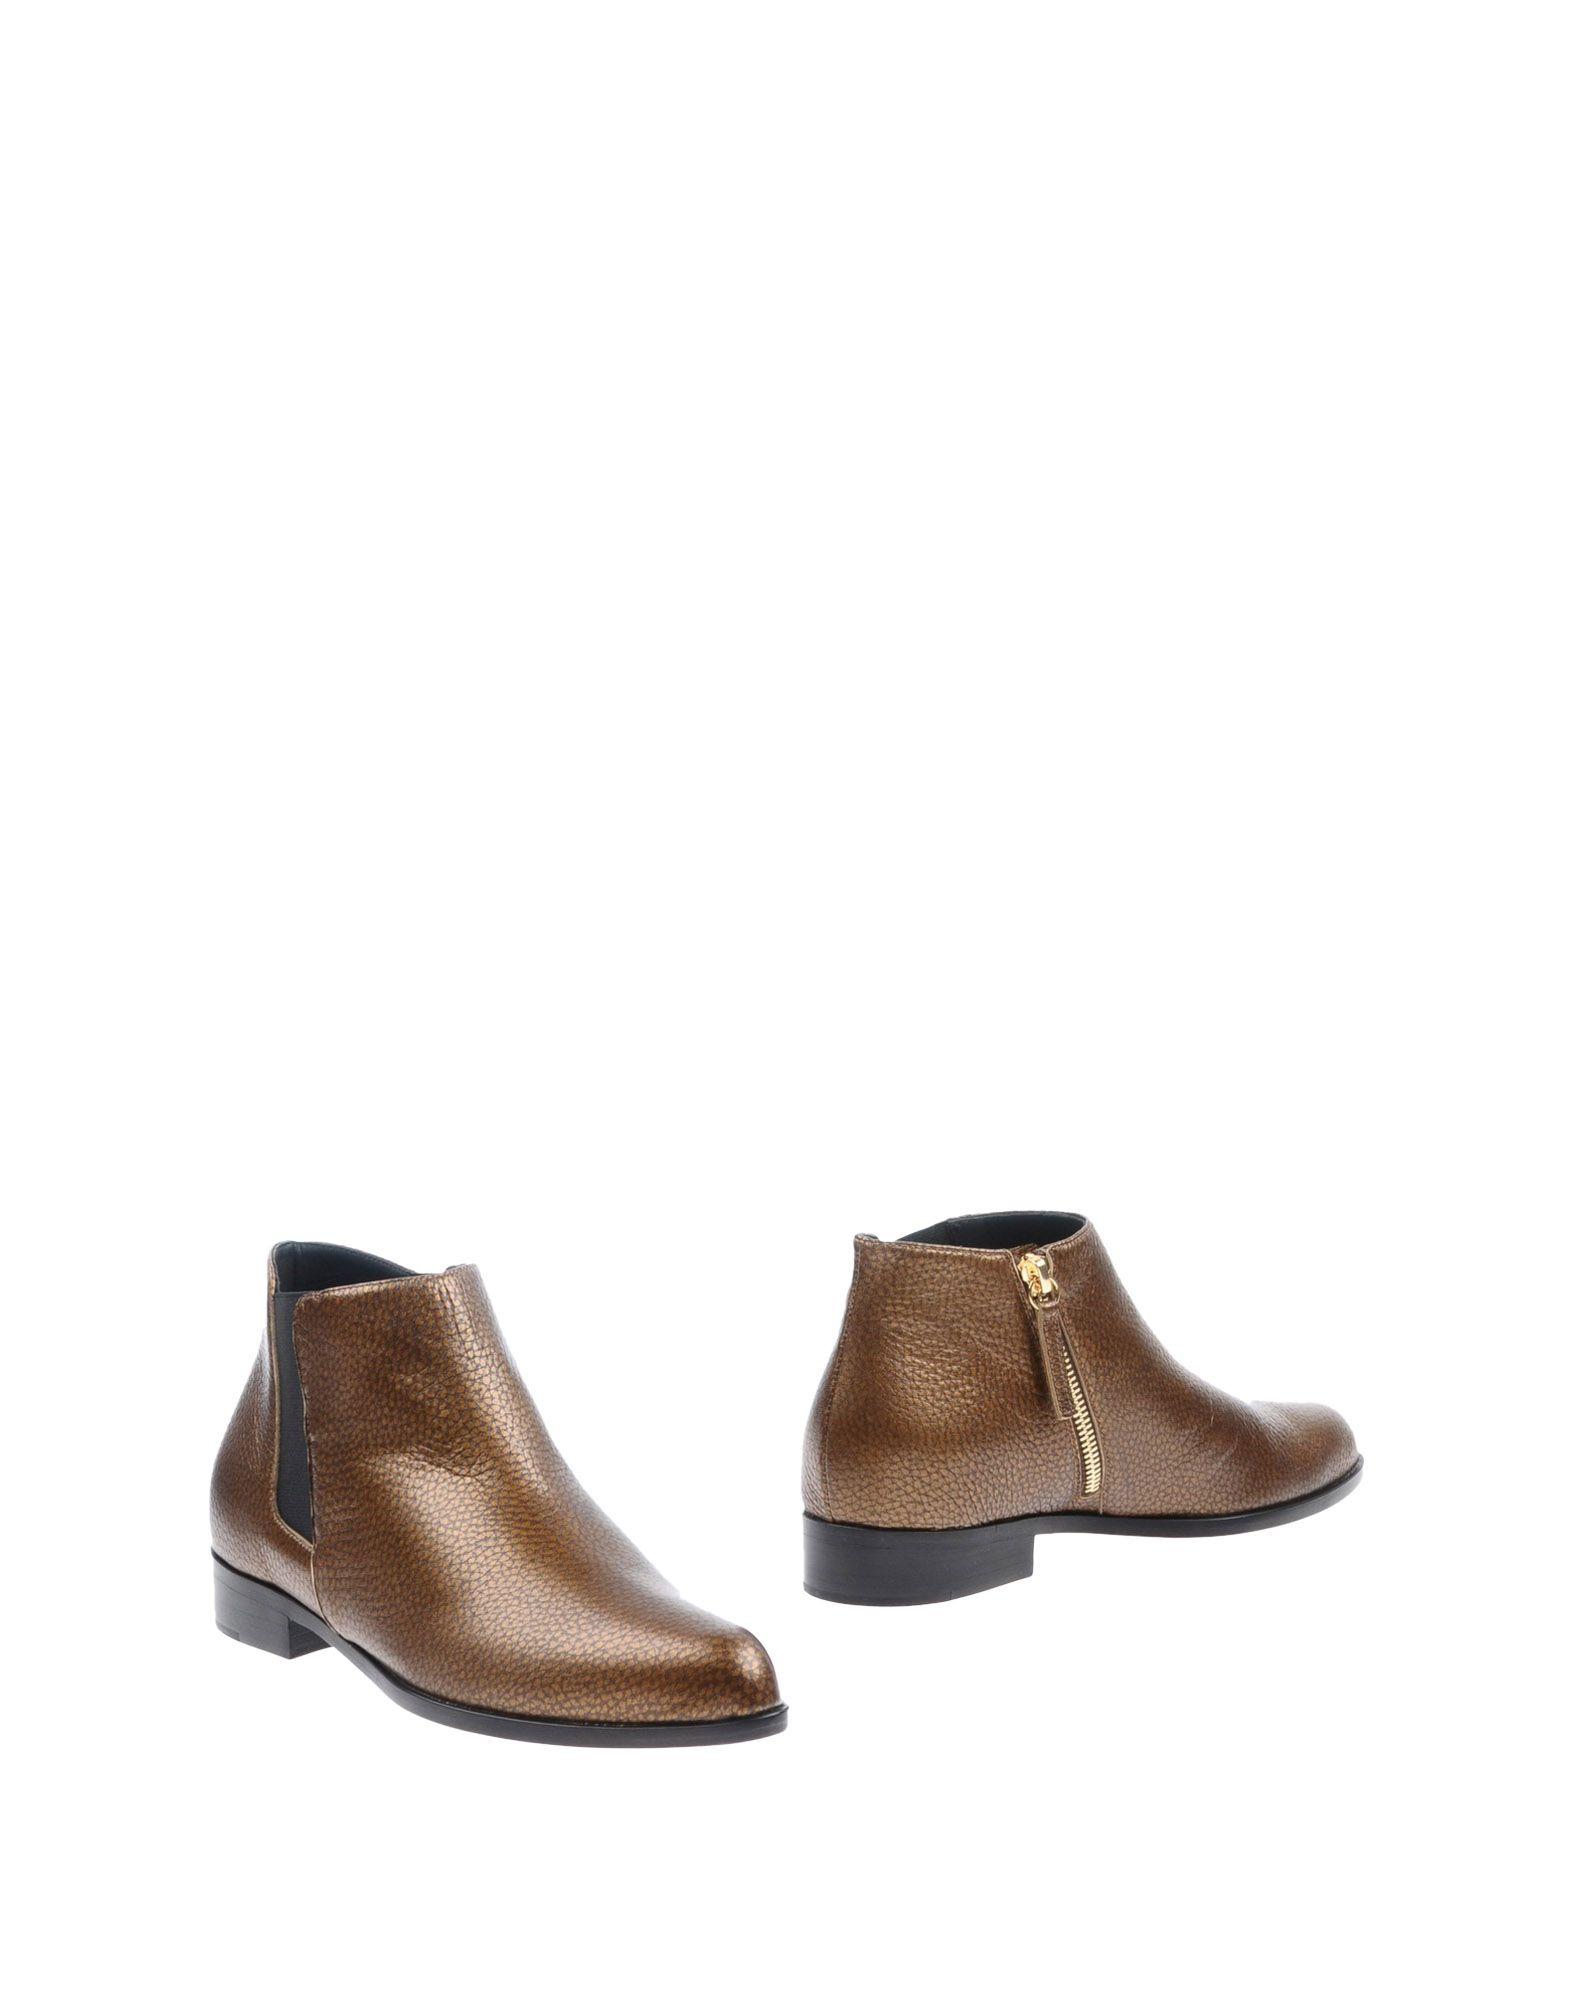 GIUSEPPE ZANOTTI DESIGN Полусапоги и высокие ботинки giuseppe zanotti design браслет